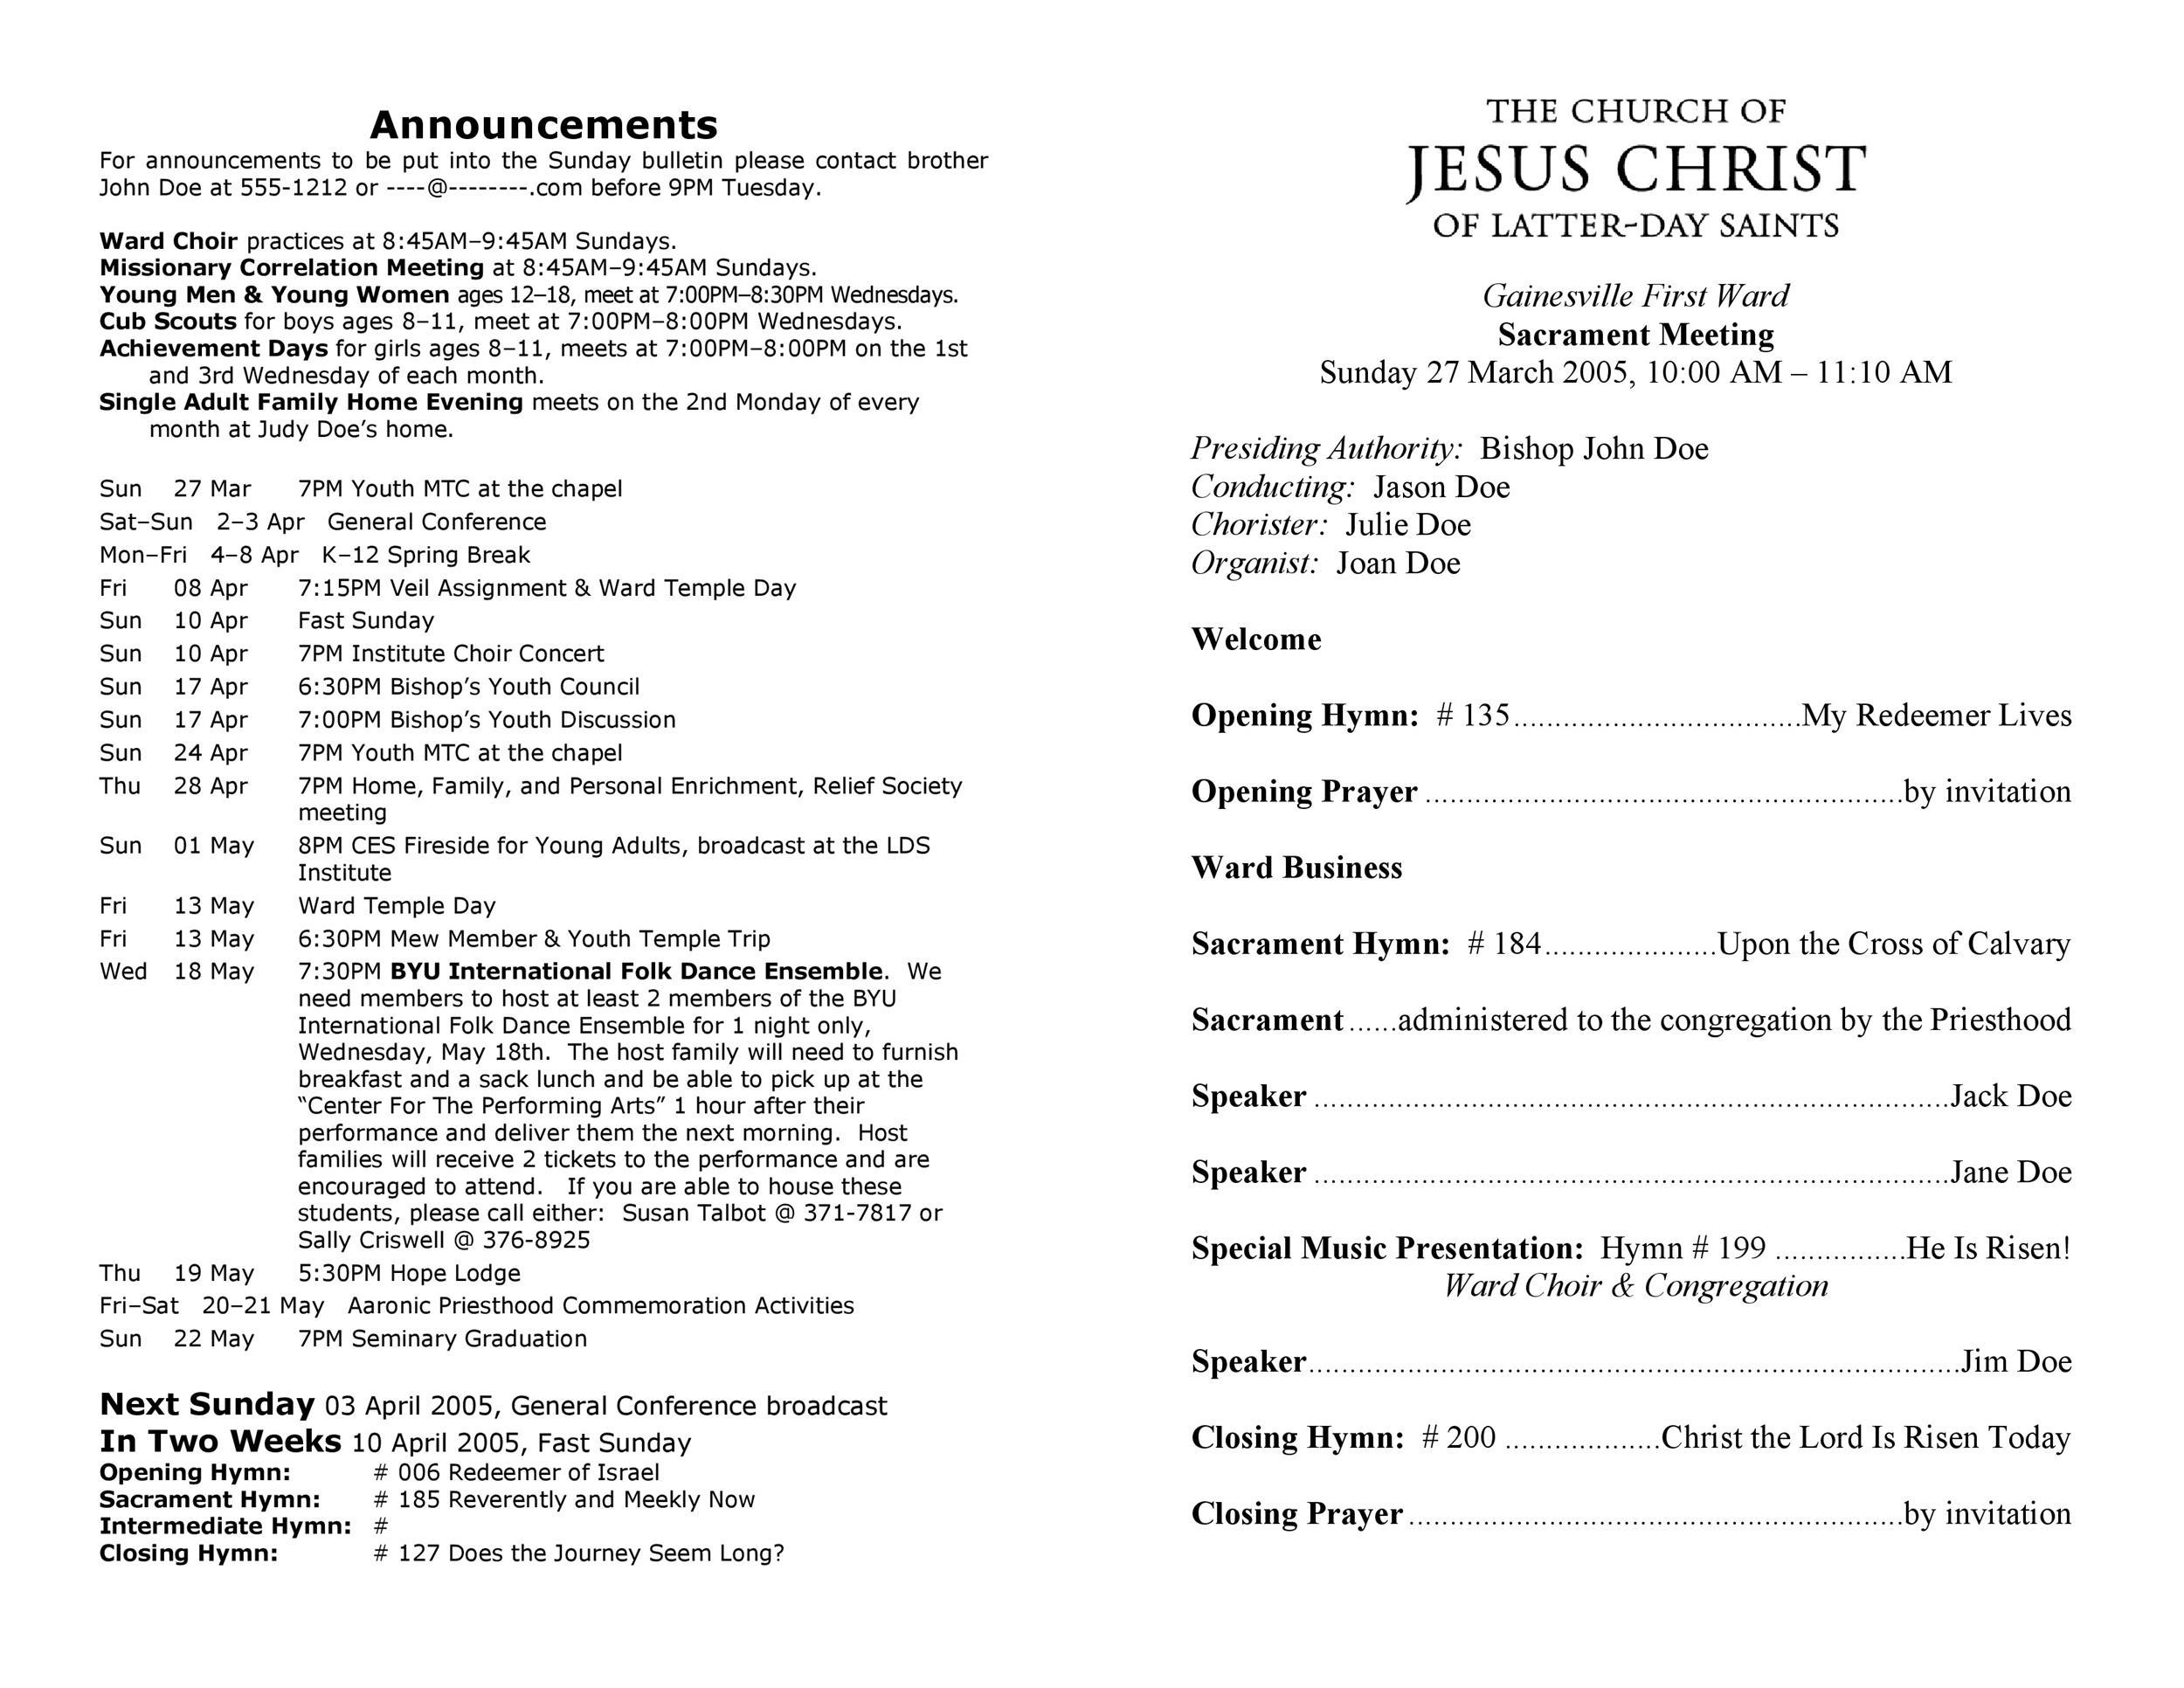 Free church bulletin templates 14